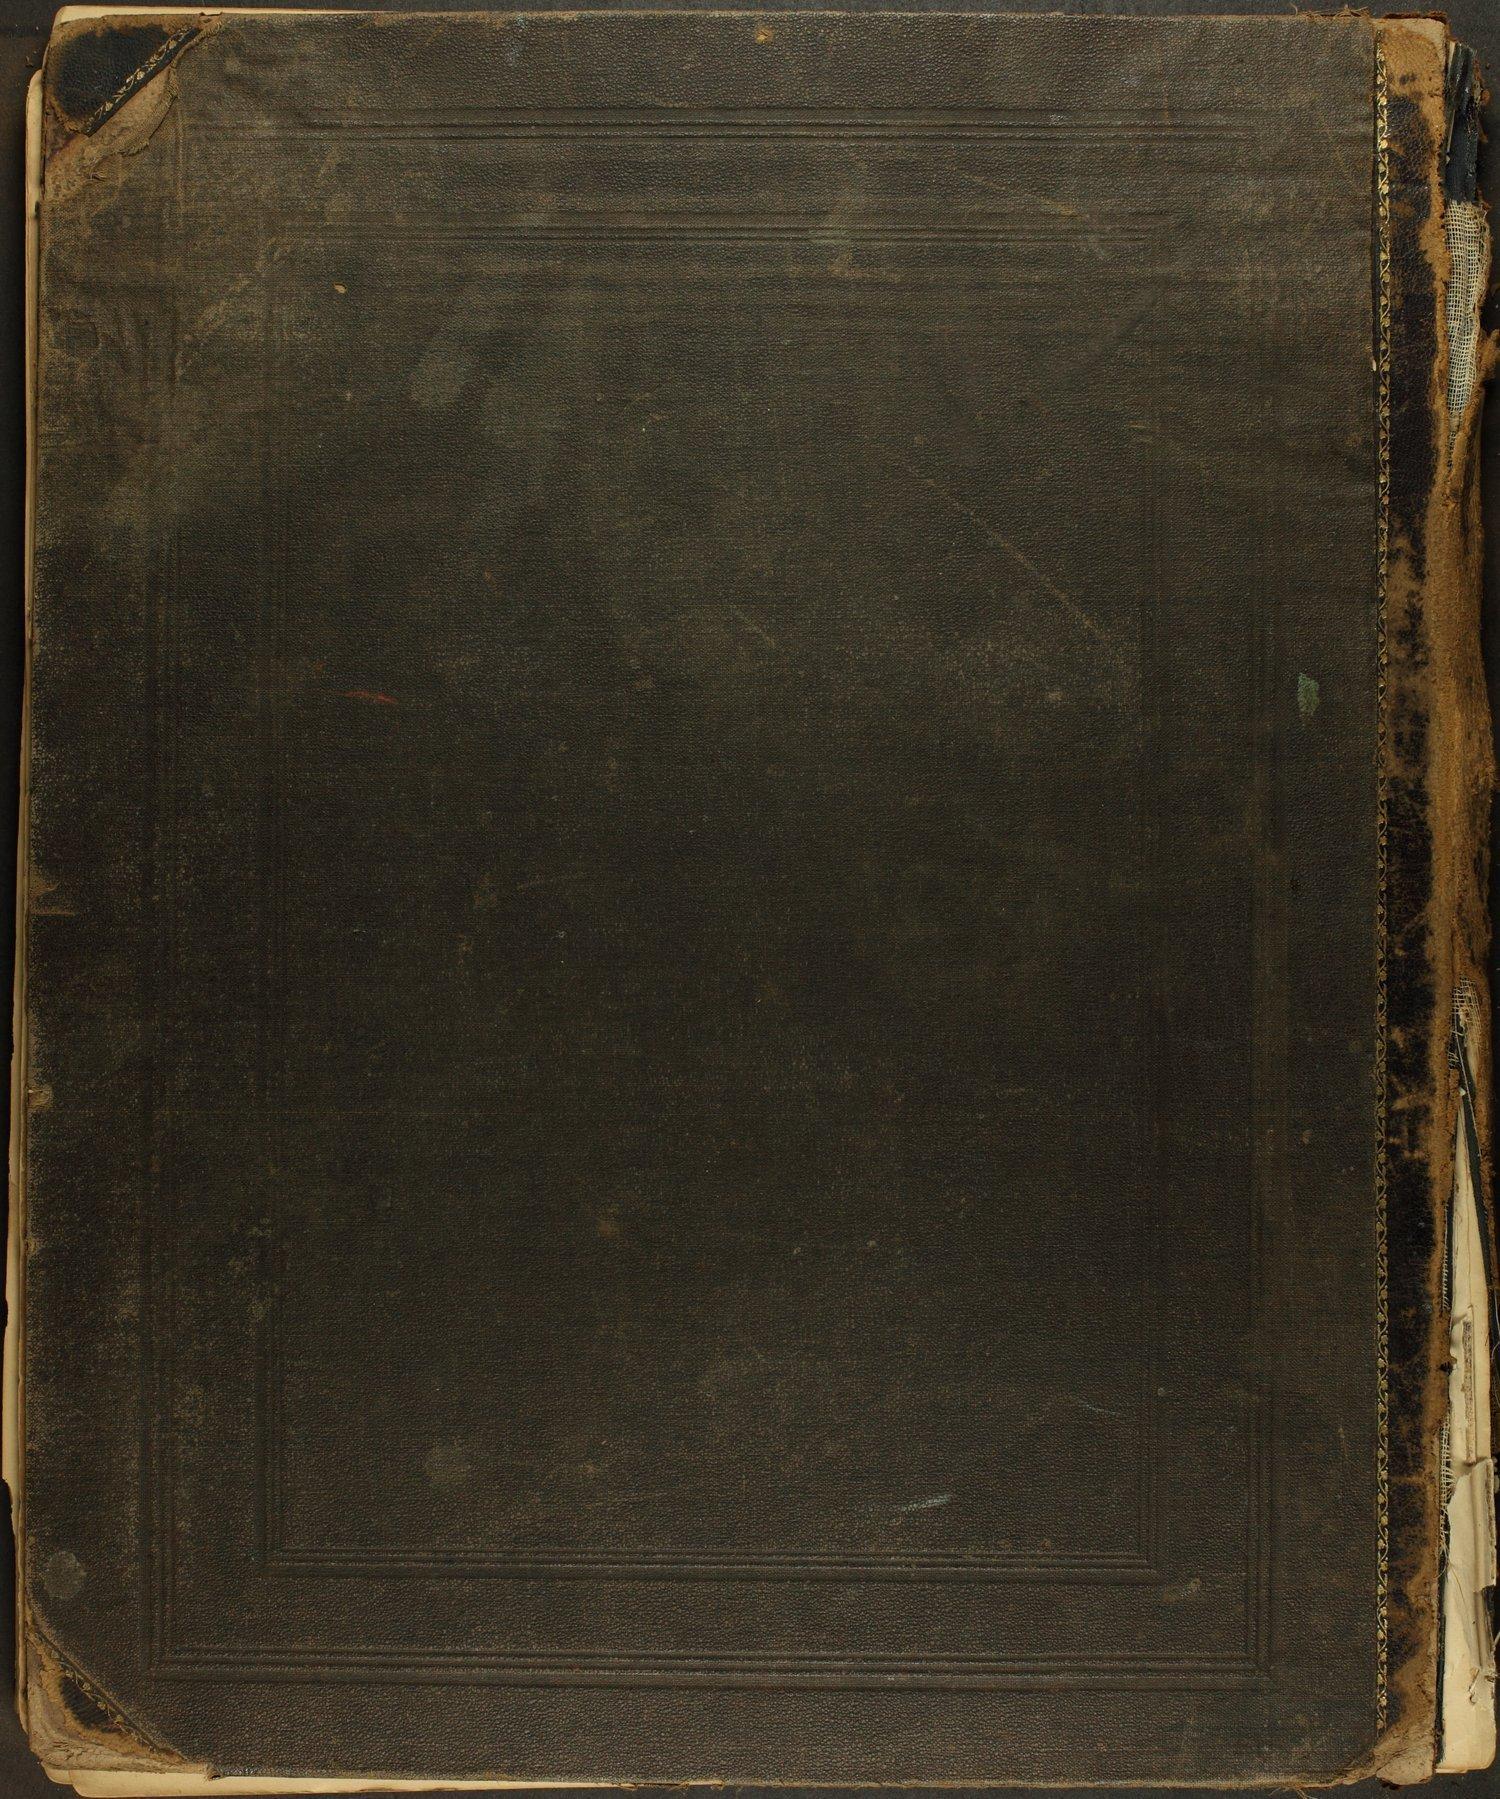 Historical Atlas of Sedgwick County, Kansas - Back Cover